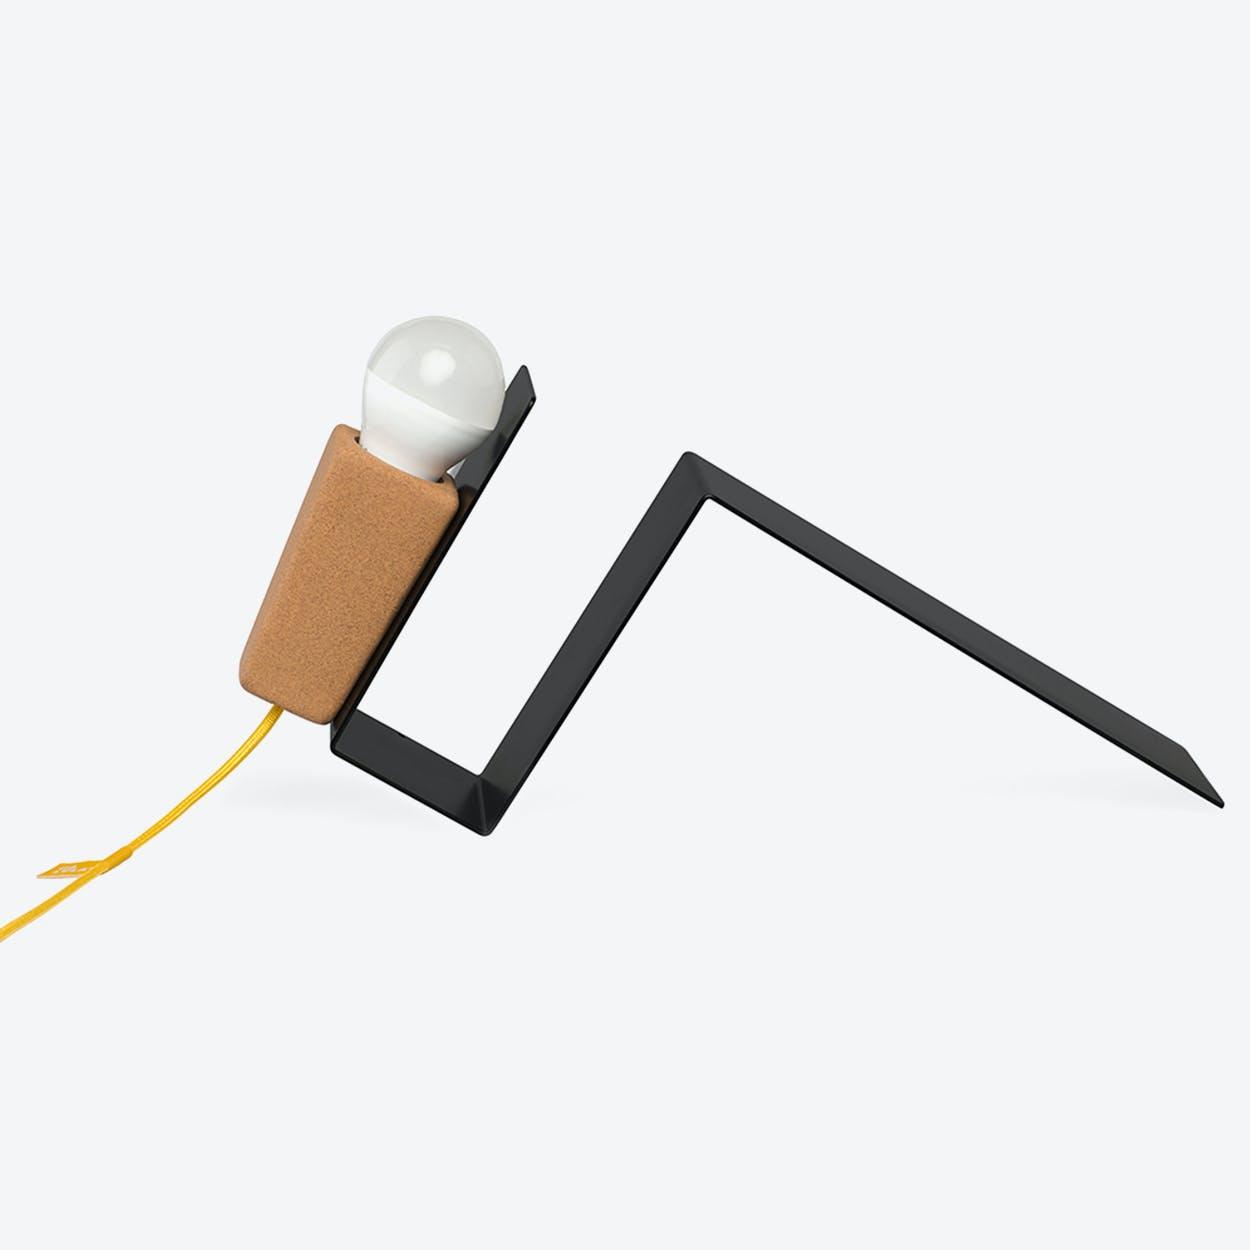 Glint Desk Lamp #1 in Black Base & Yellow Wire